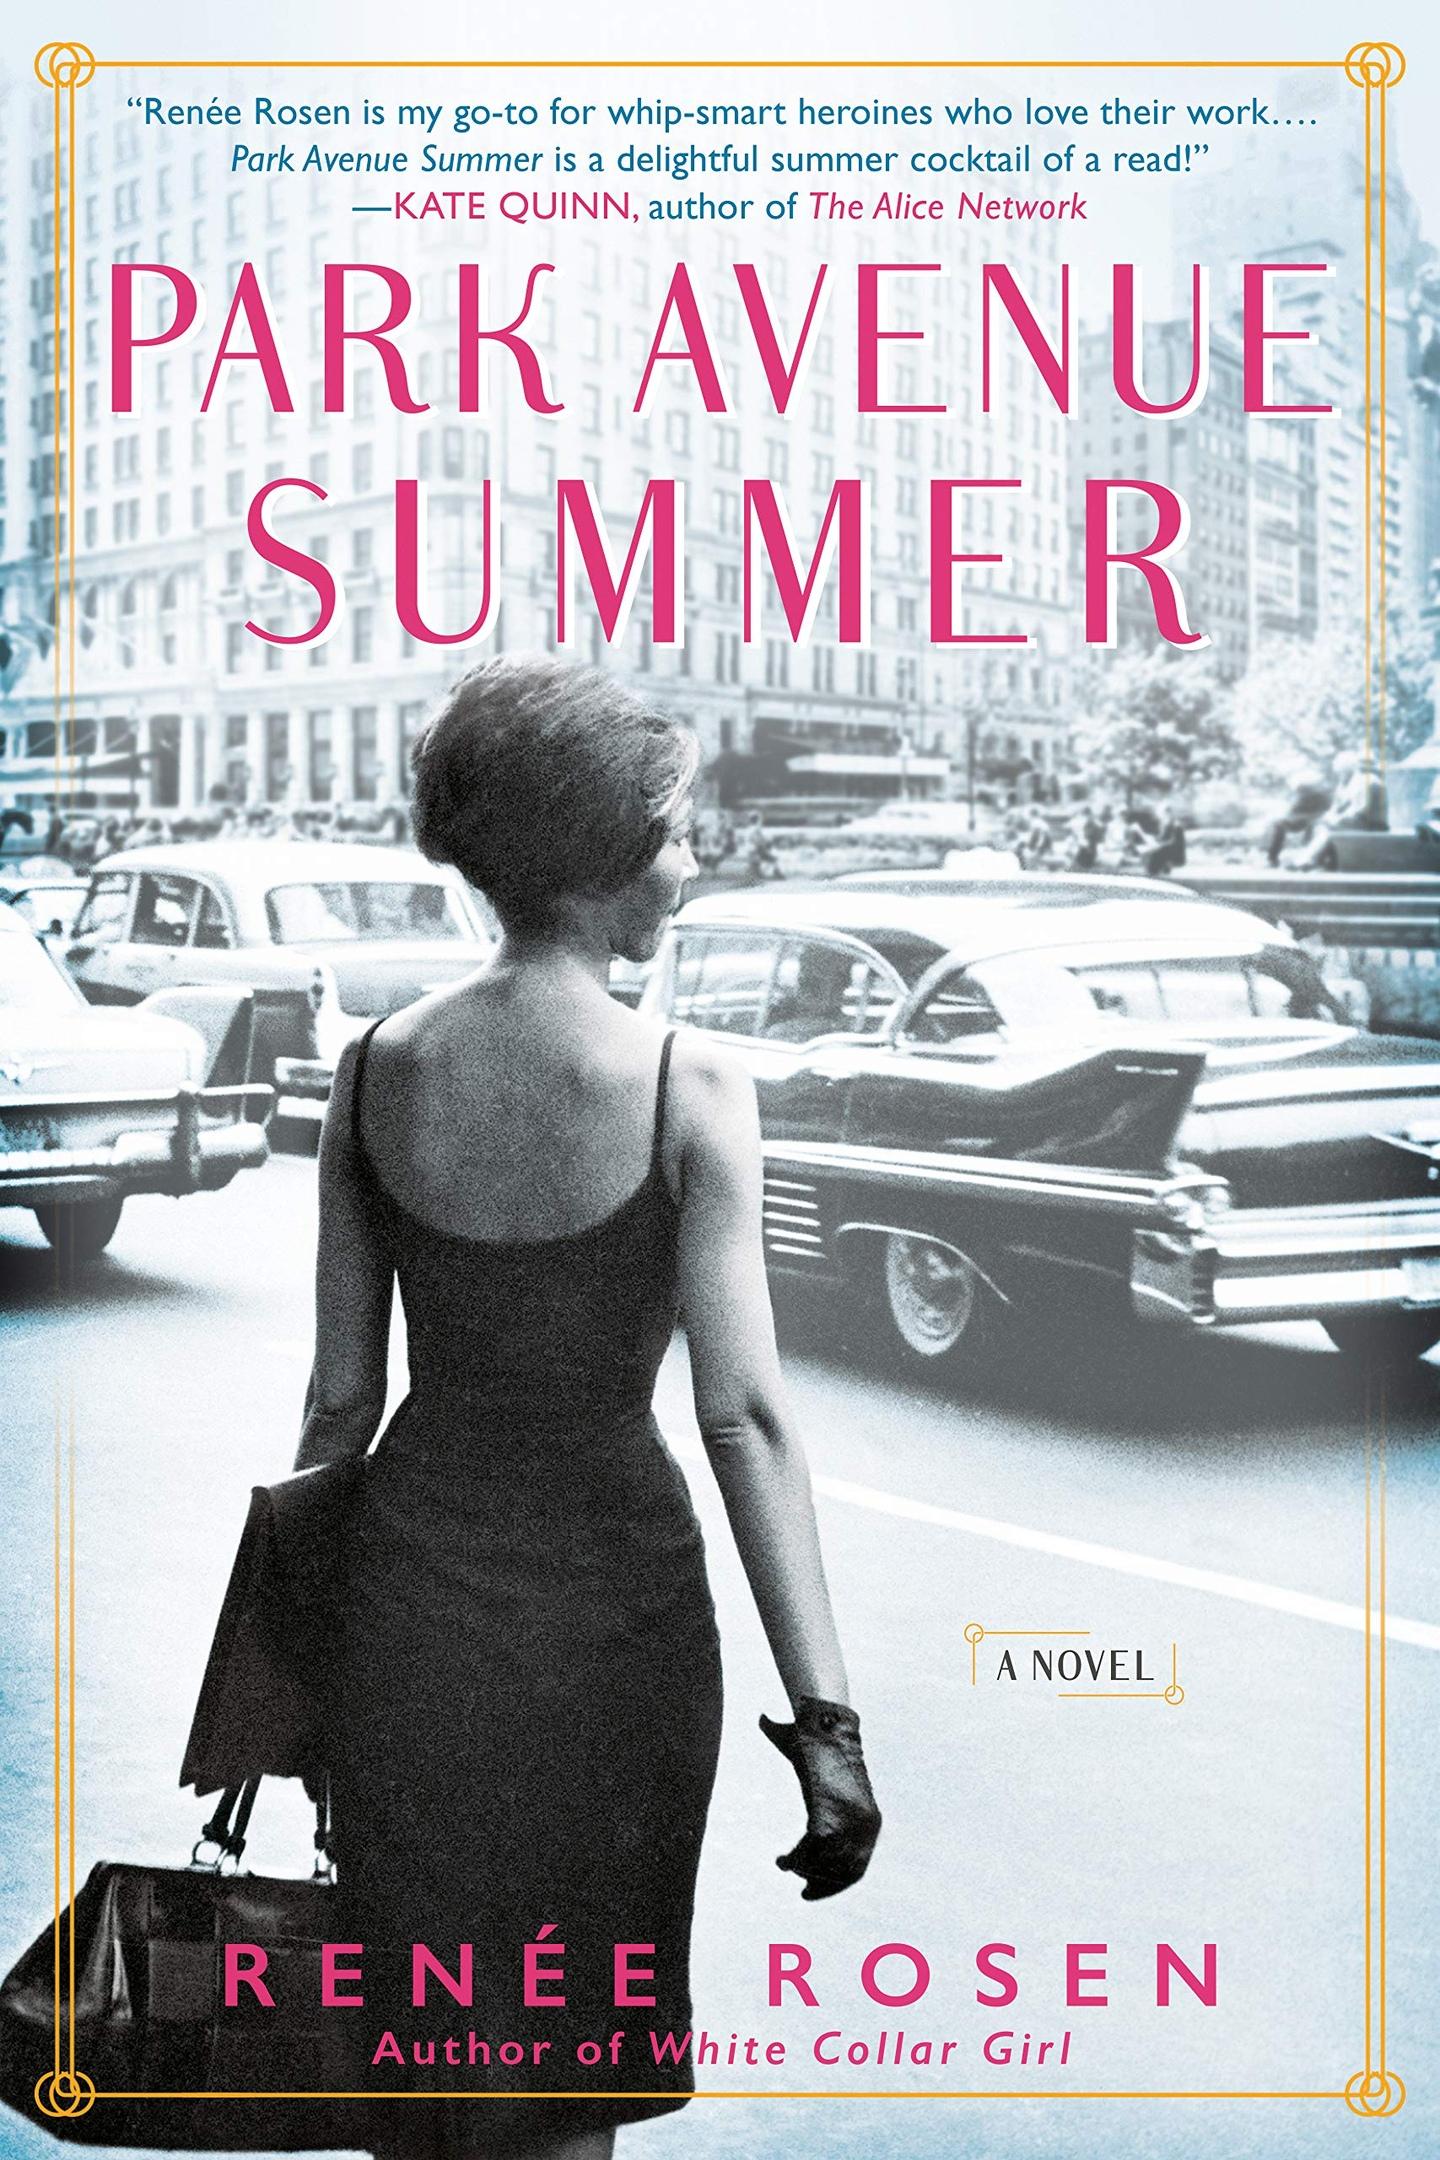 Renée Rosen – Park Avenue Summer Genre: